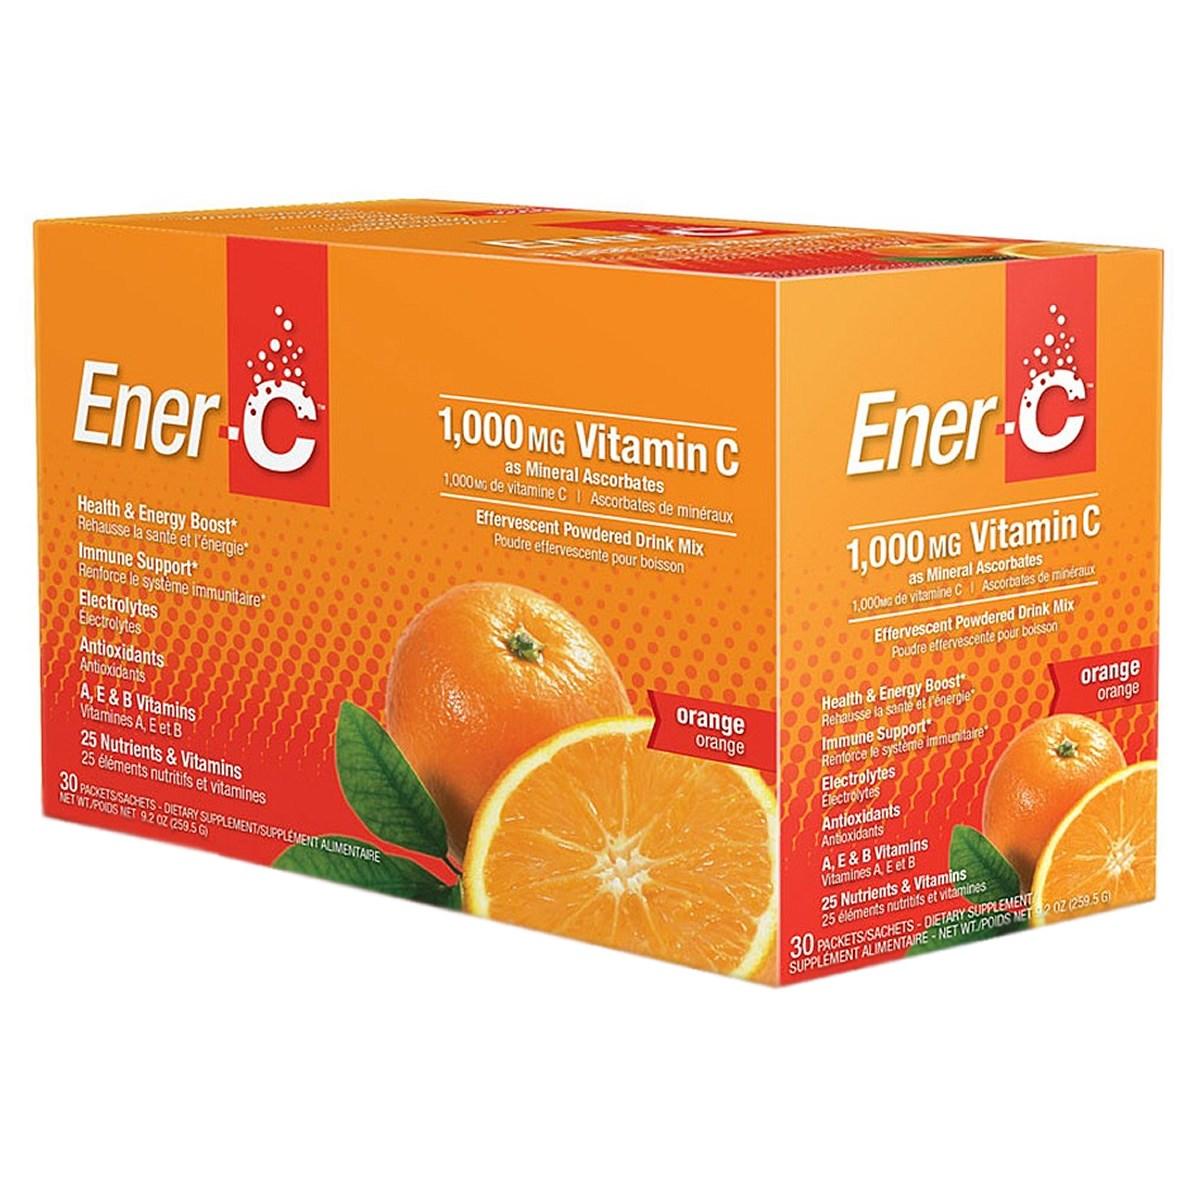 Ener-C 1000mg Vitamin C - Orange